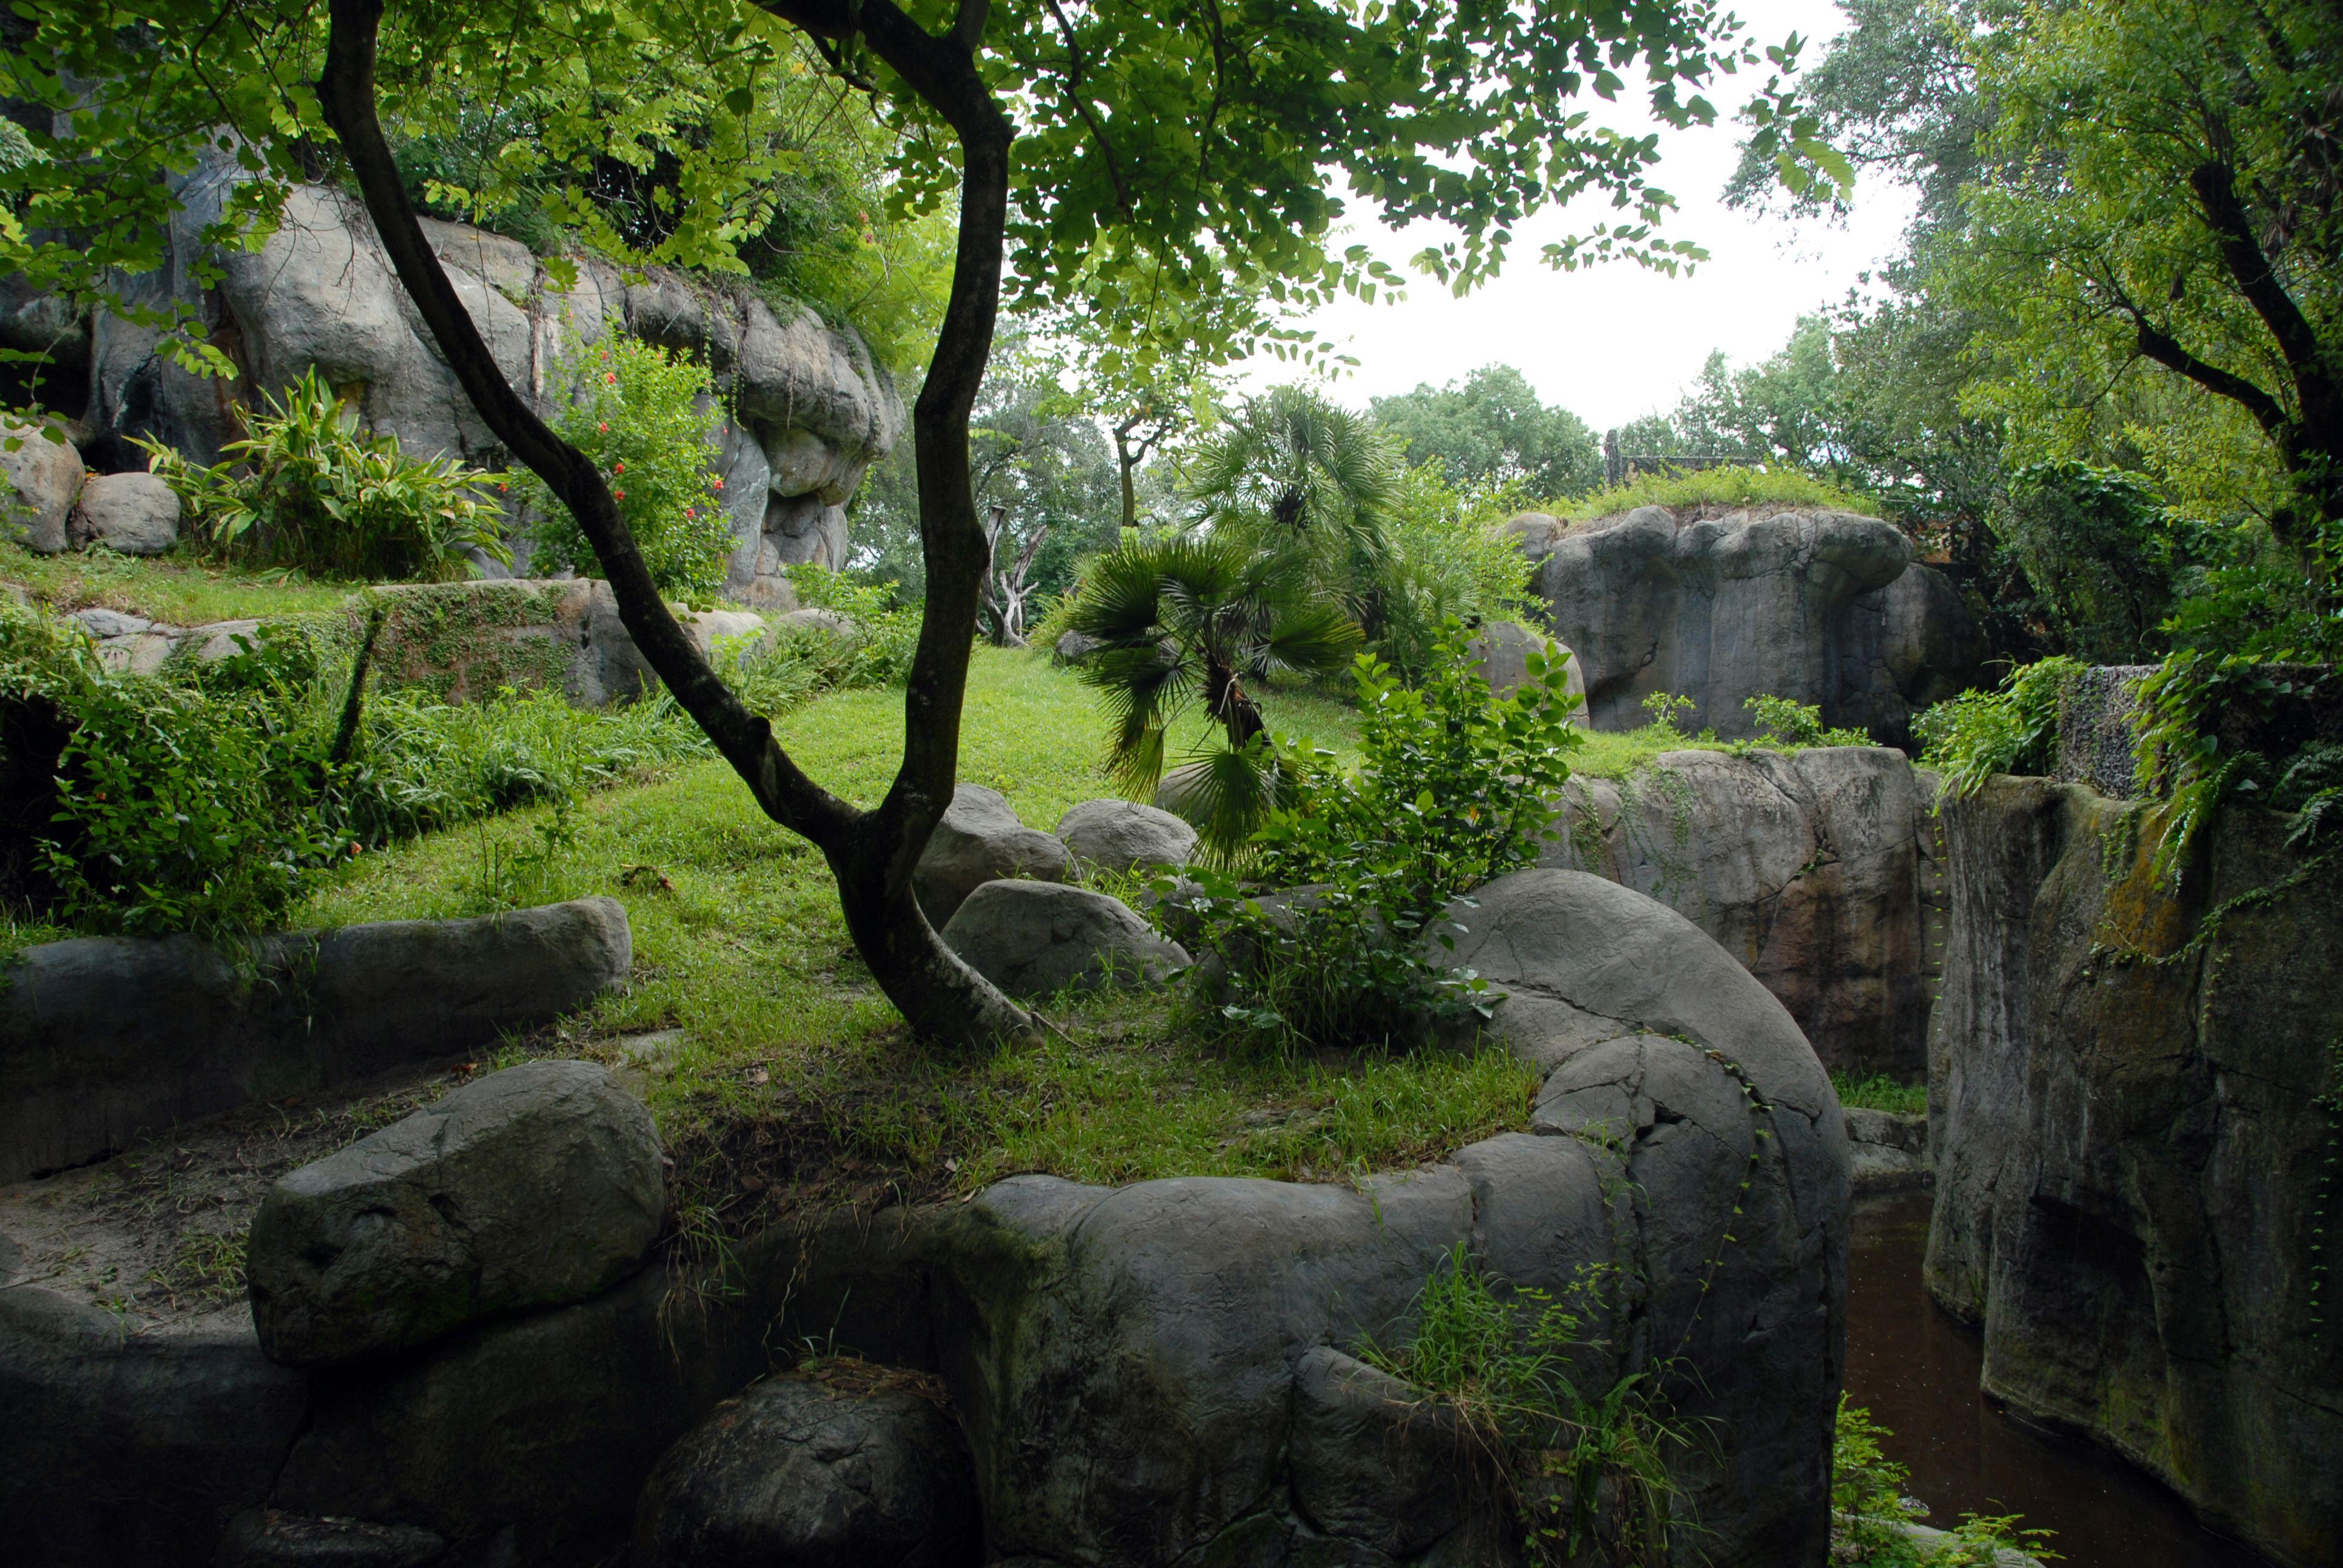 High Definition Nature Green Dream Hd 3872x2592 Jungle Wallpaper